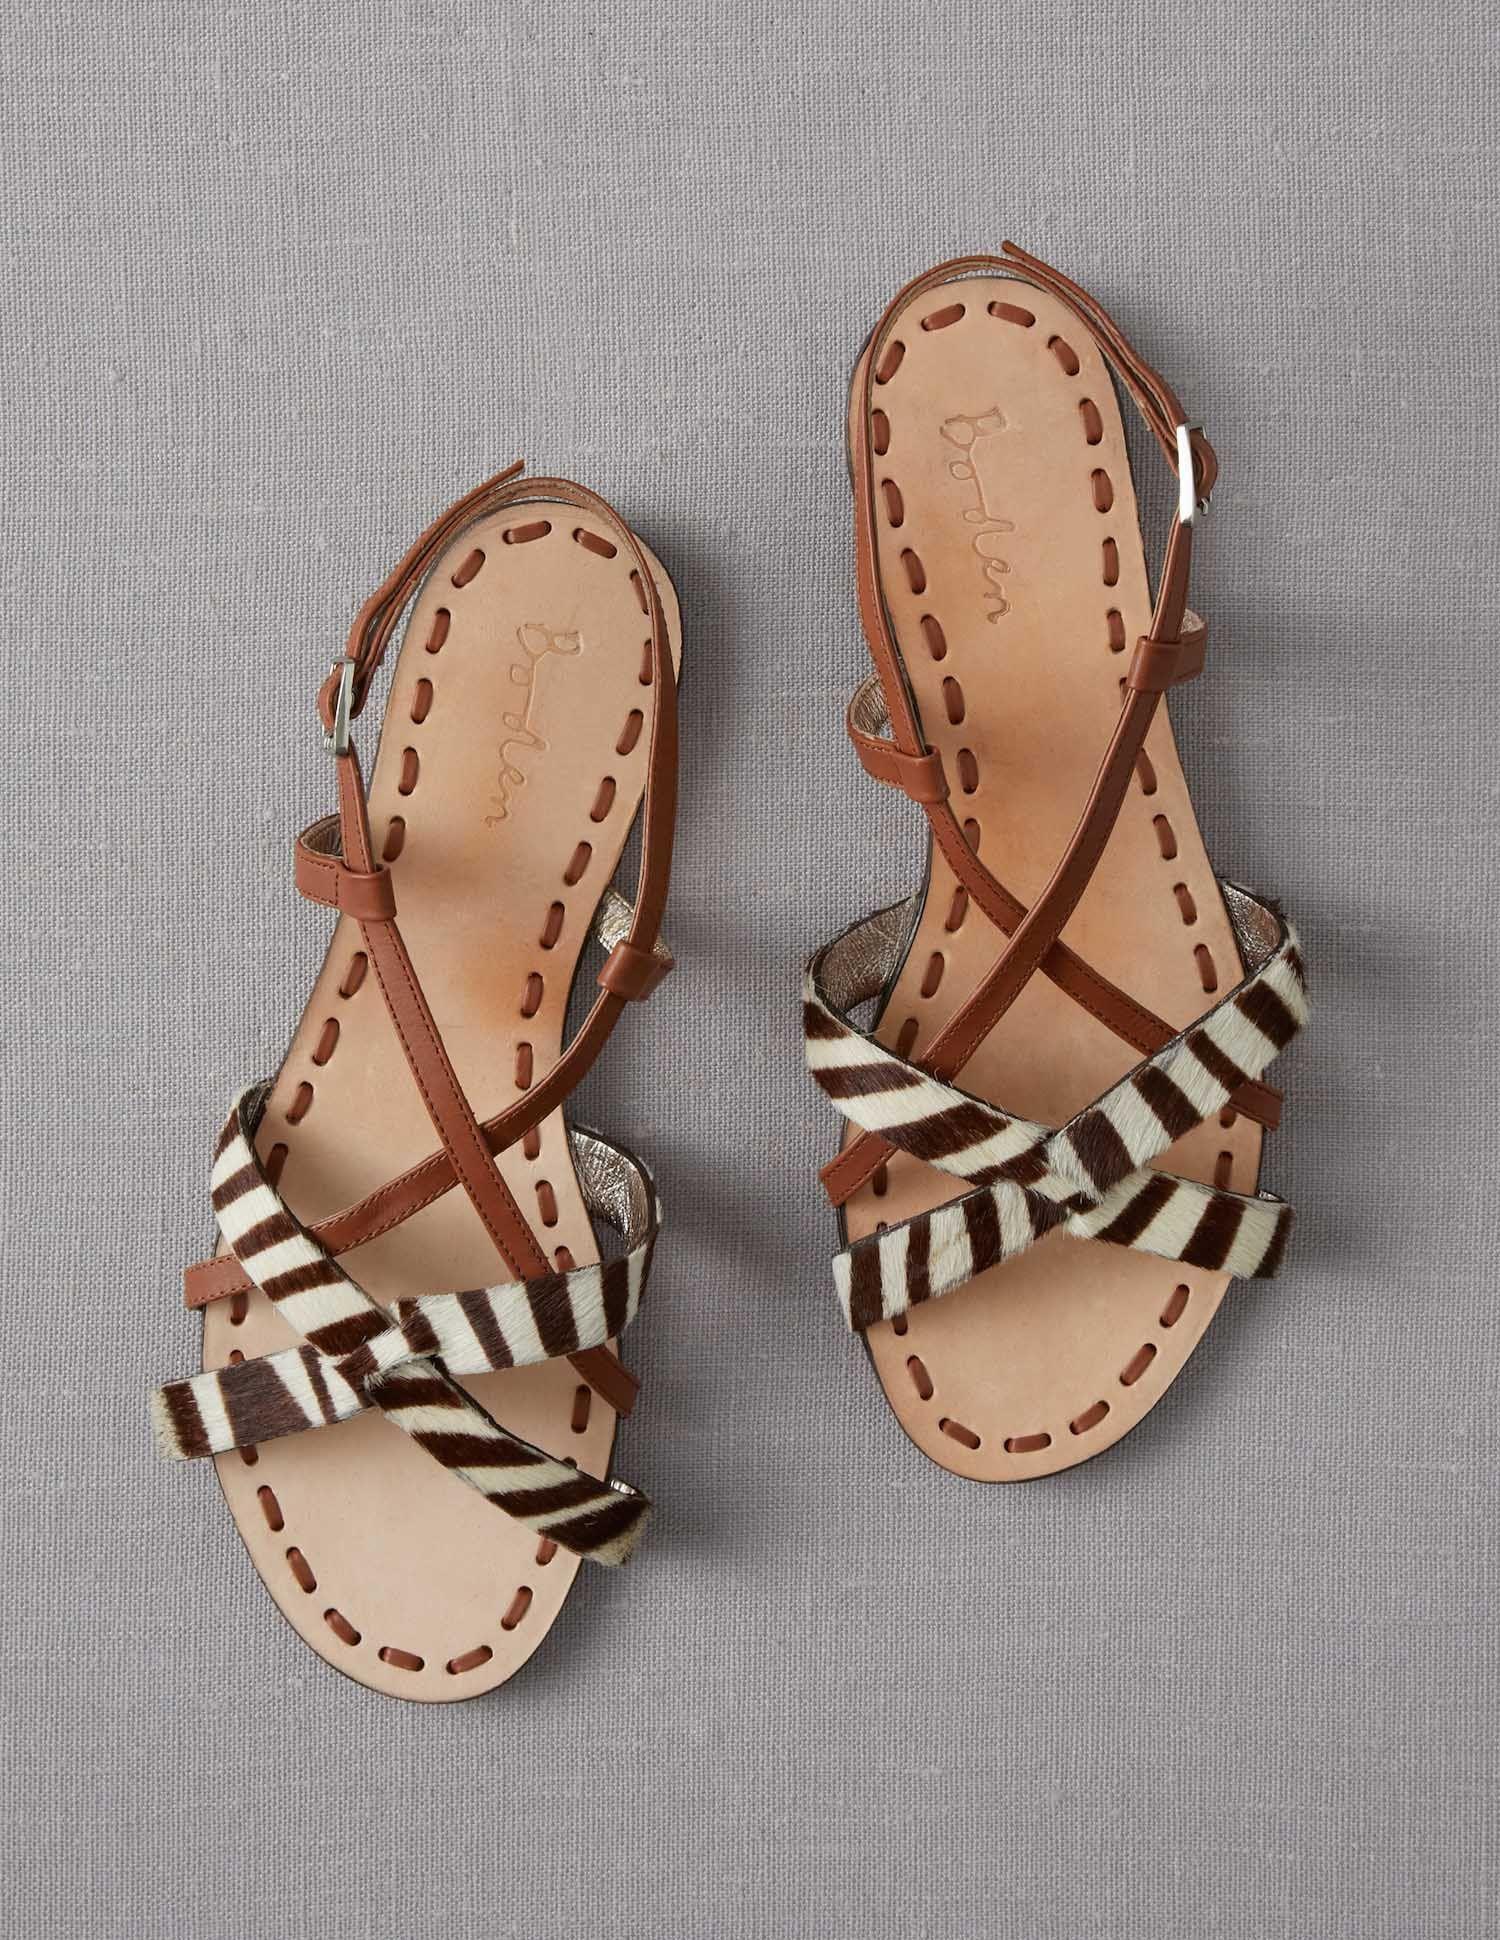 Boden Women S Brand New Strappy Sandals Zebra Cow Hide Tan